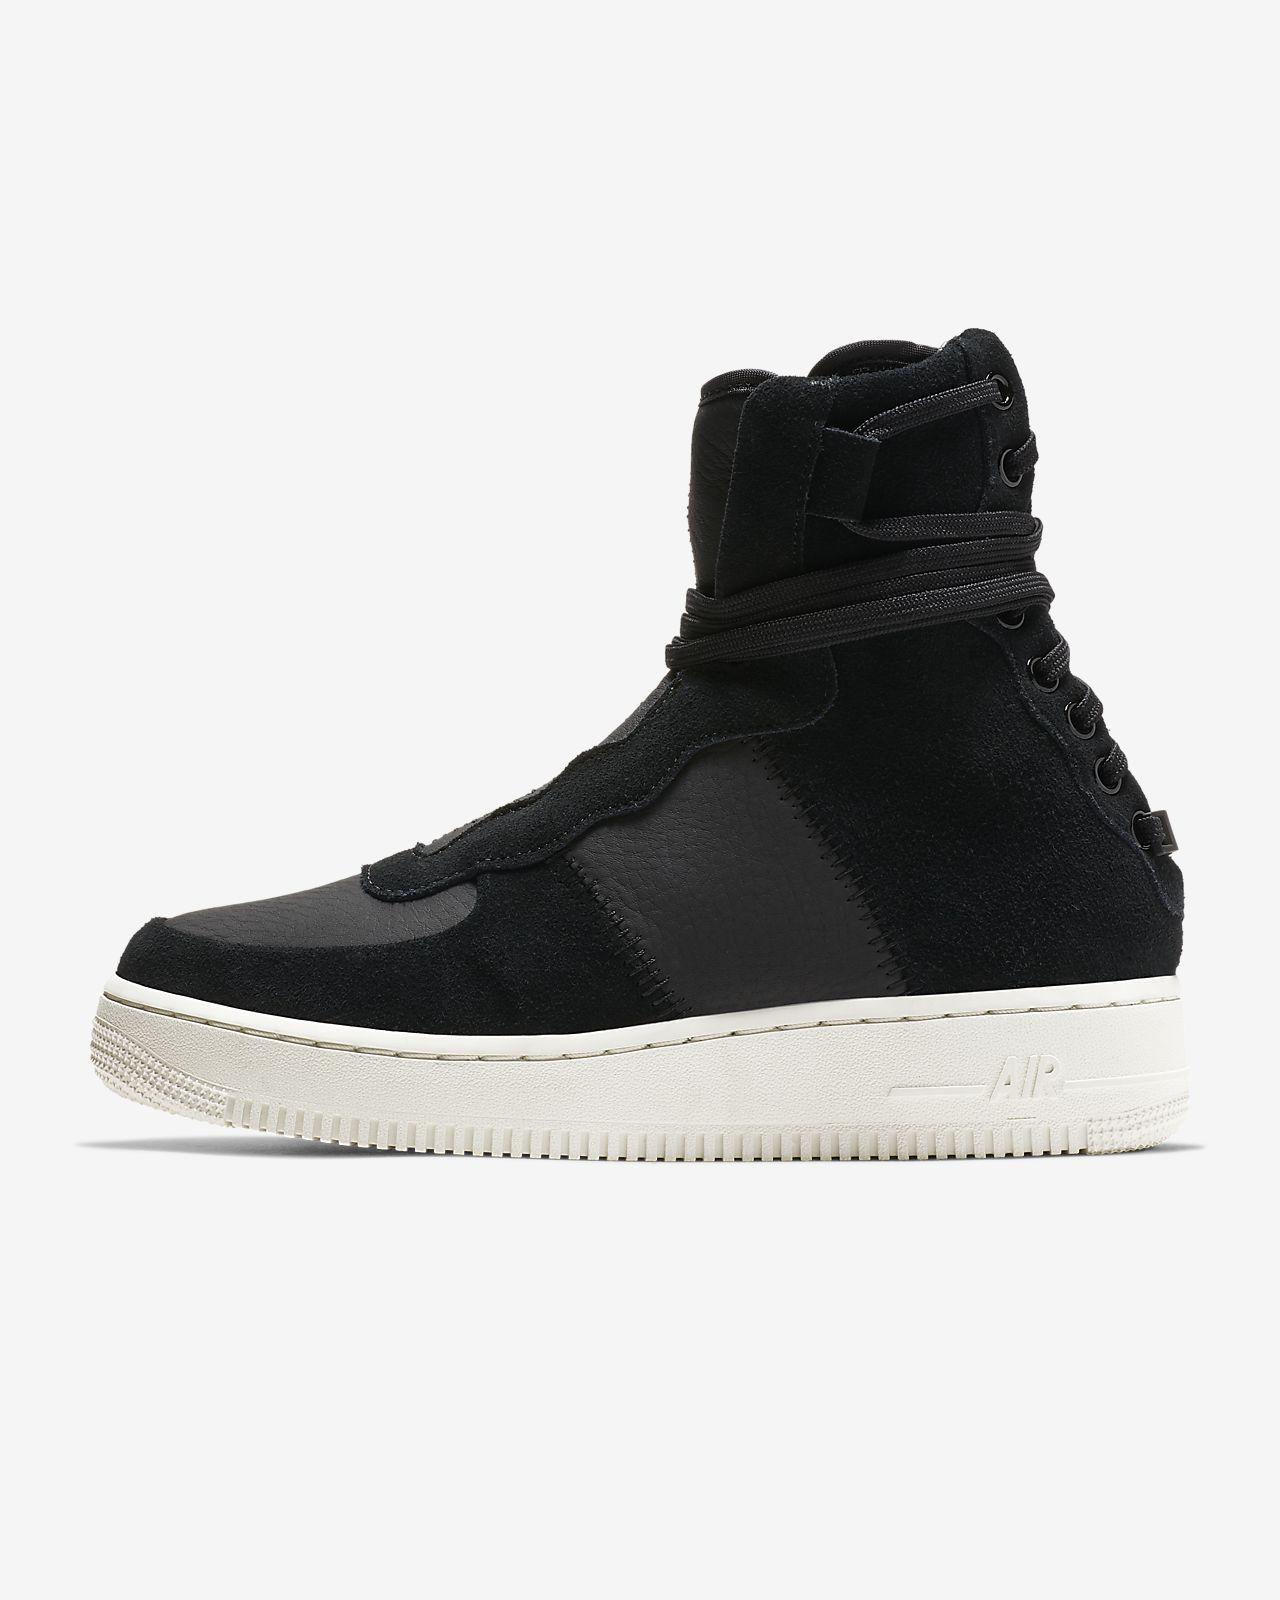 Sko Nike Air Force 1 Rebel XX Premium för kvinnor